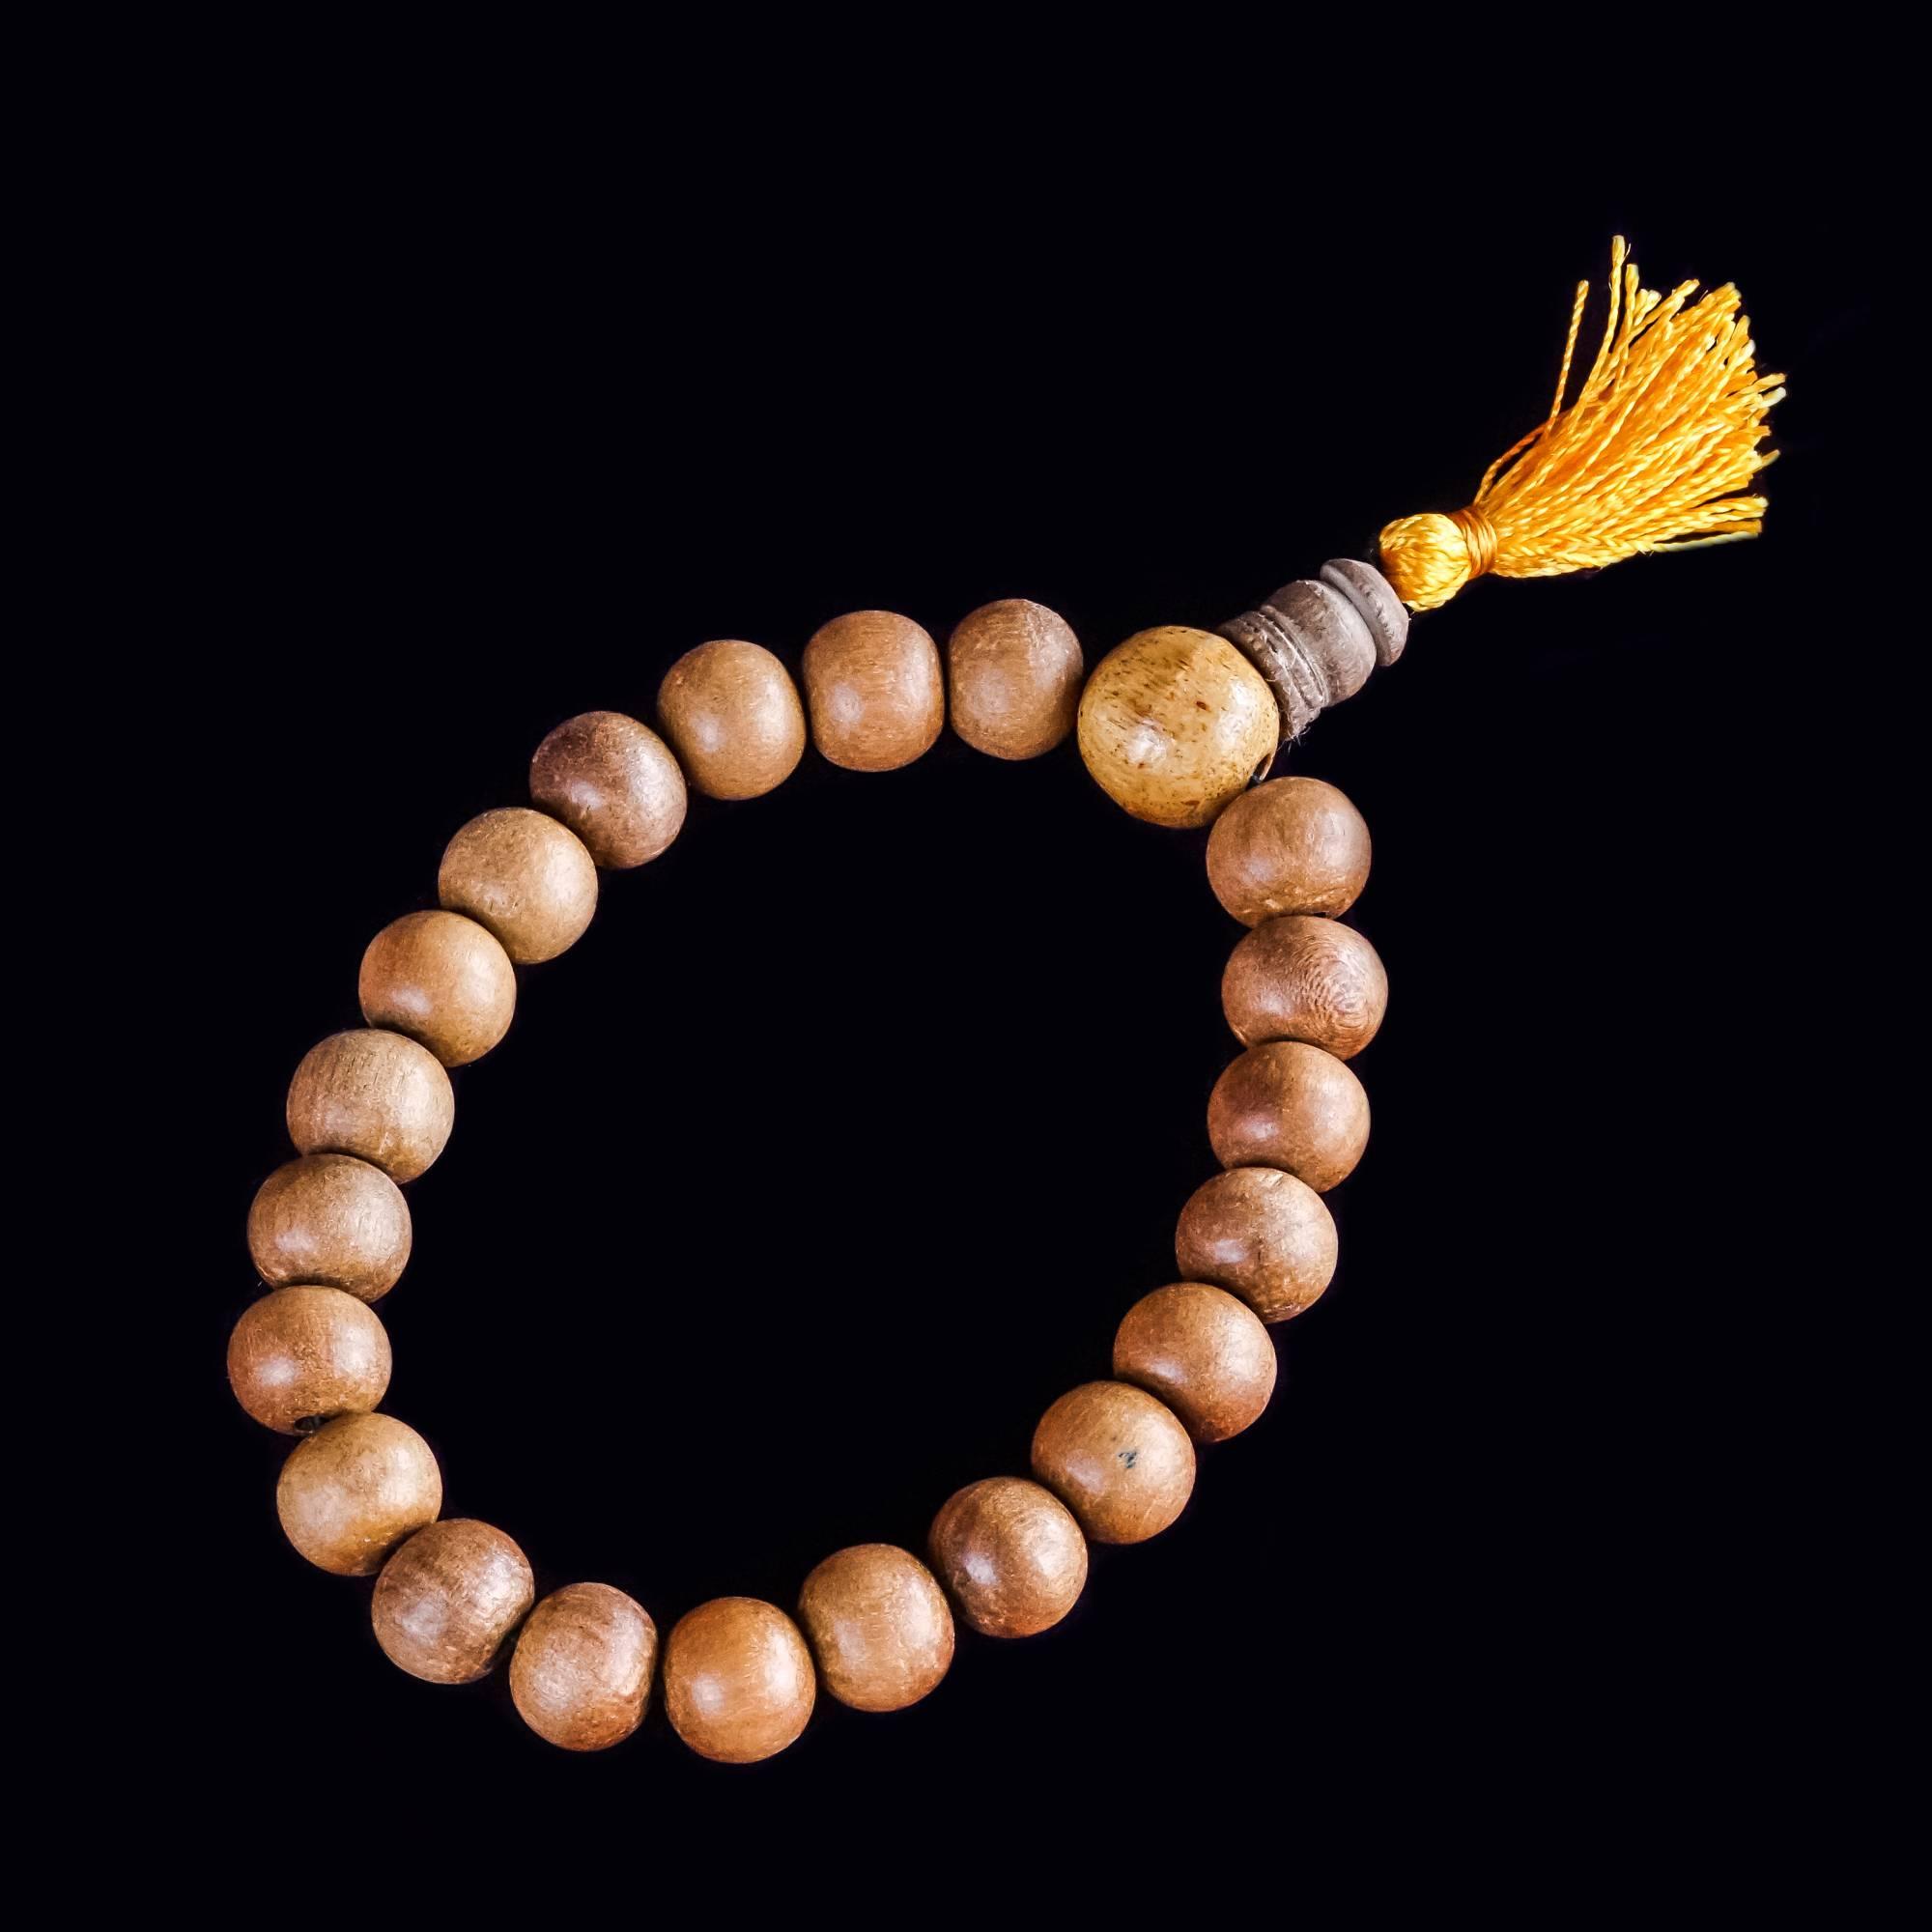 Sandalwood Mala Bracelets for meditation and connection to Spirit